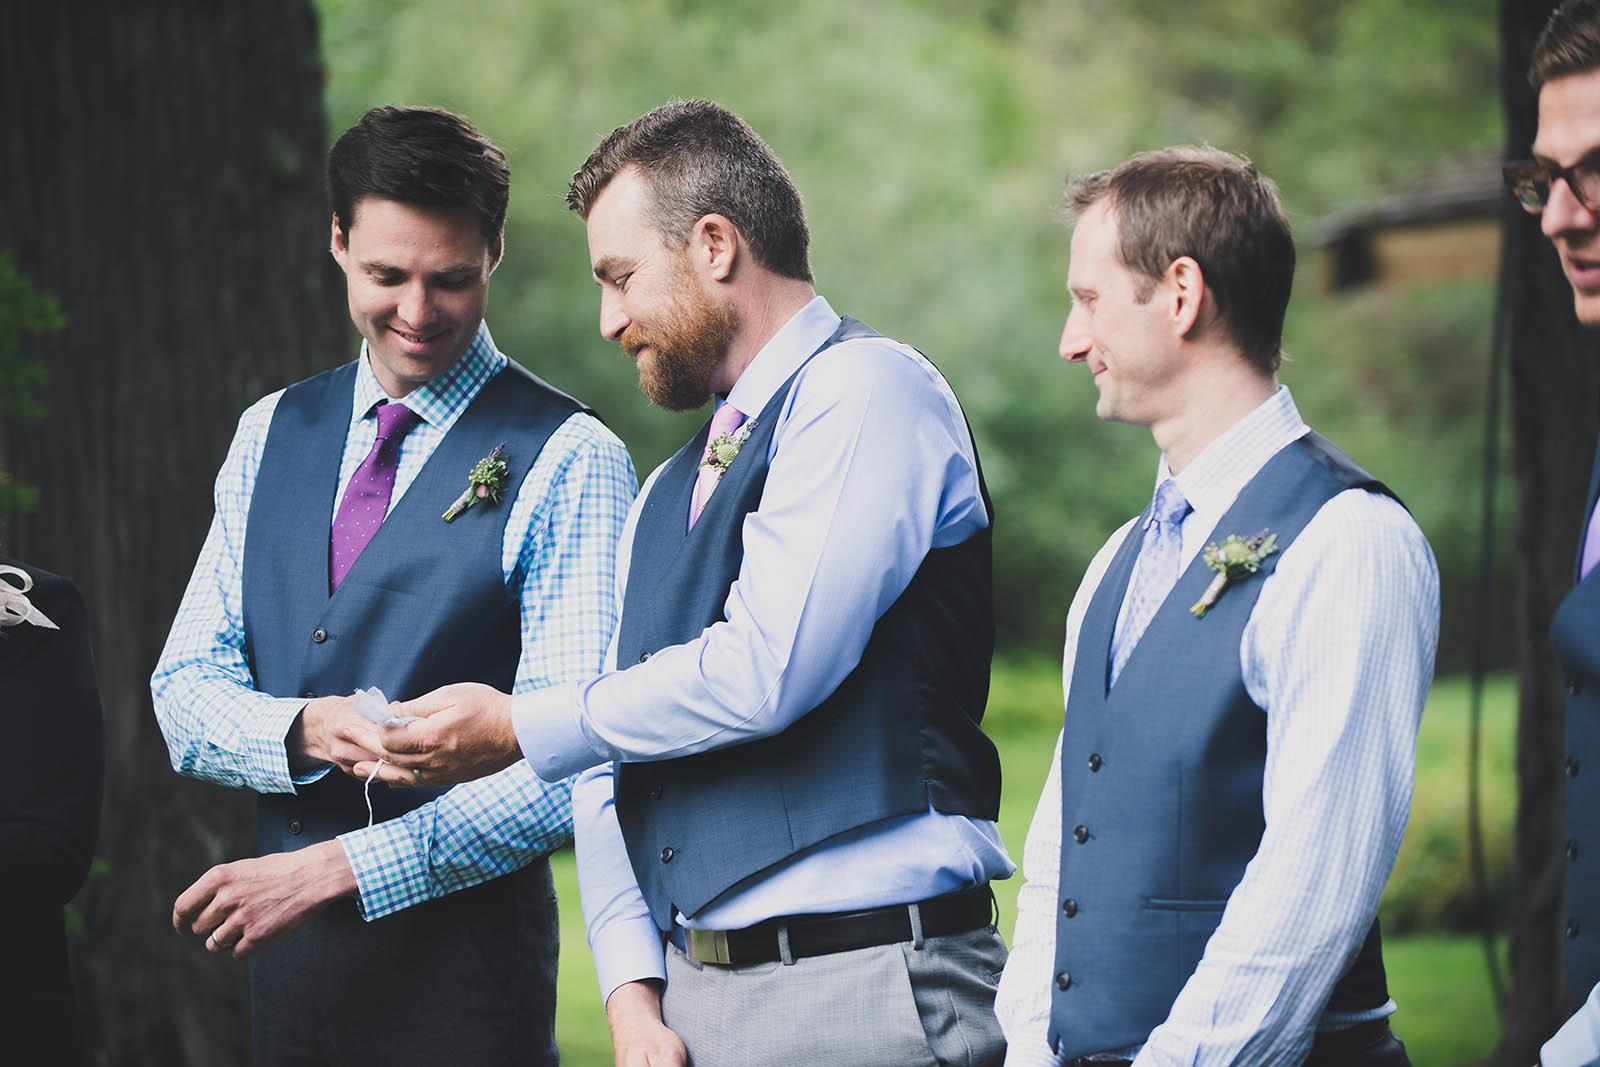 Groomsmen with Life Threads Wedding Ceremonies